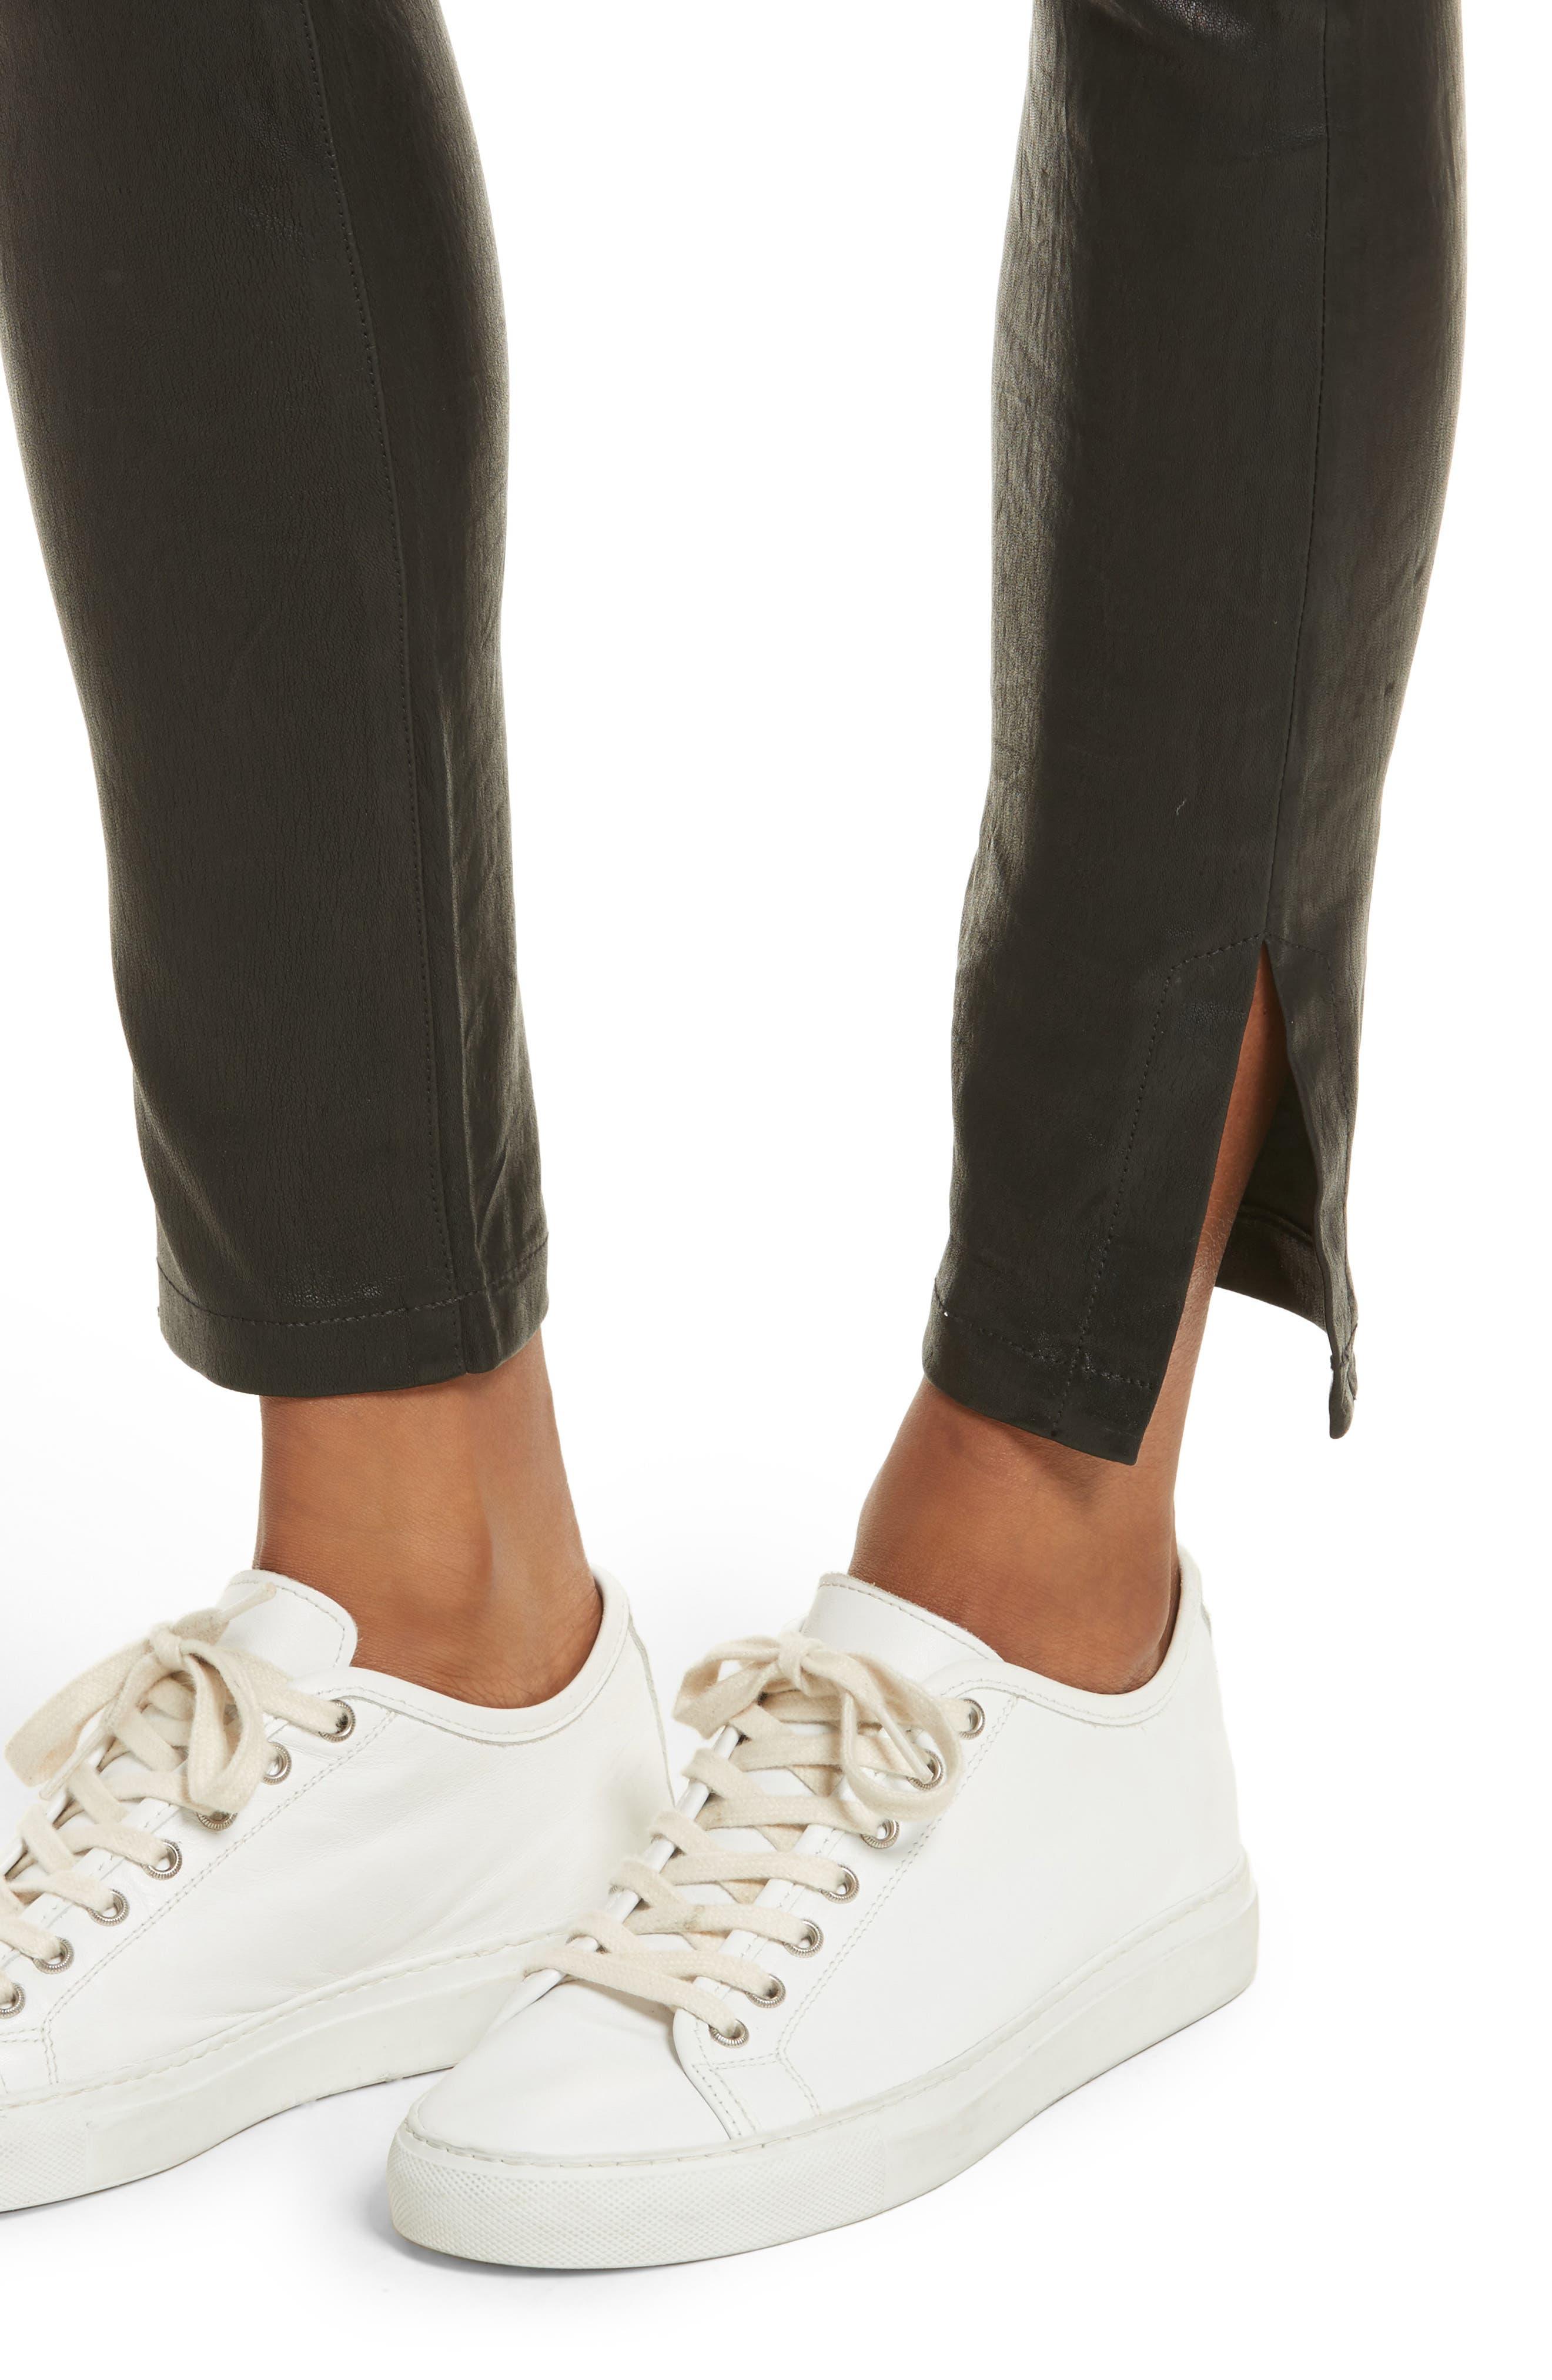 Le High Skinny Slit Leather Pants,                             Alternate thumbnail 4, color,                             Washed Black